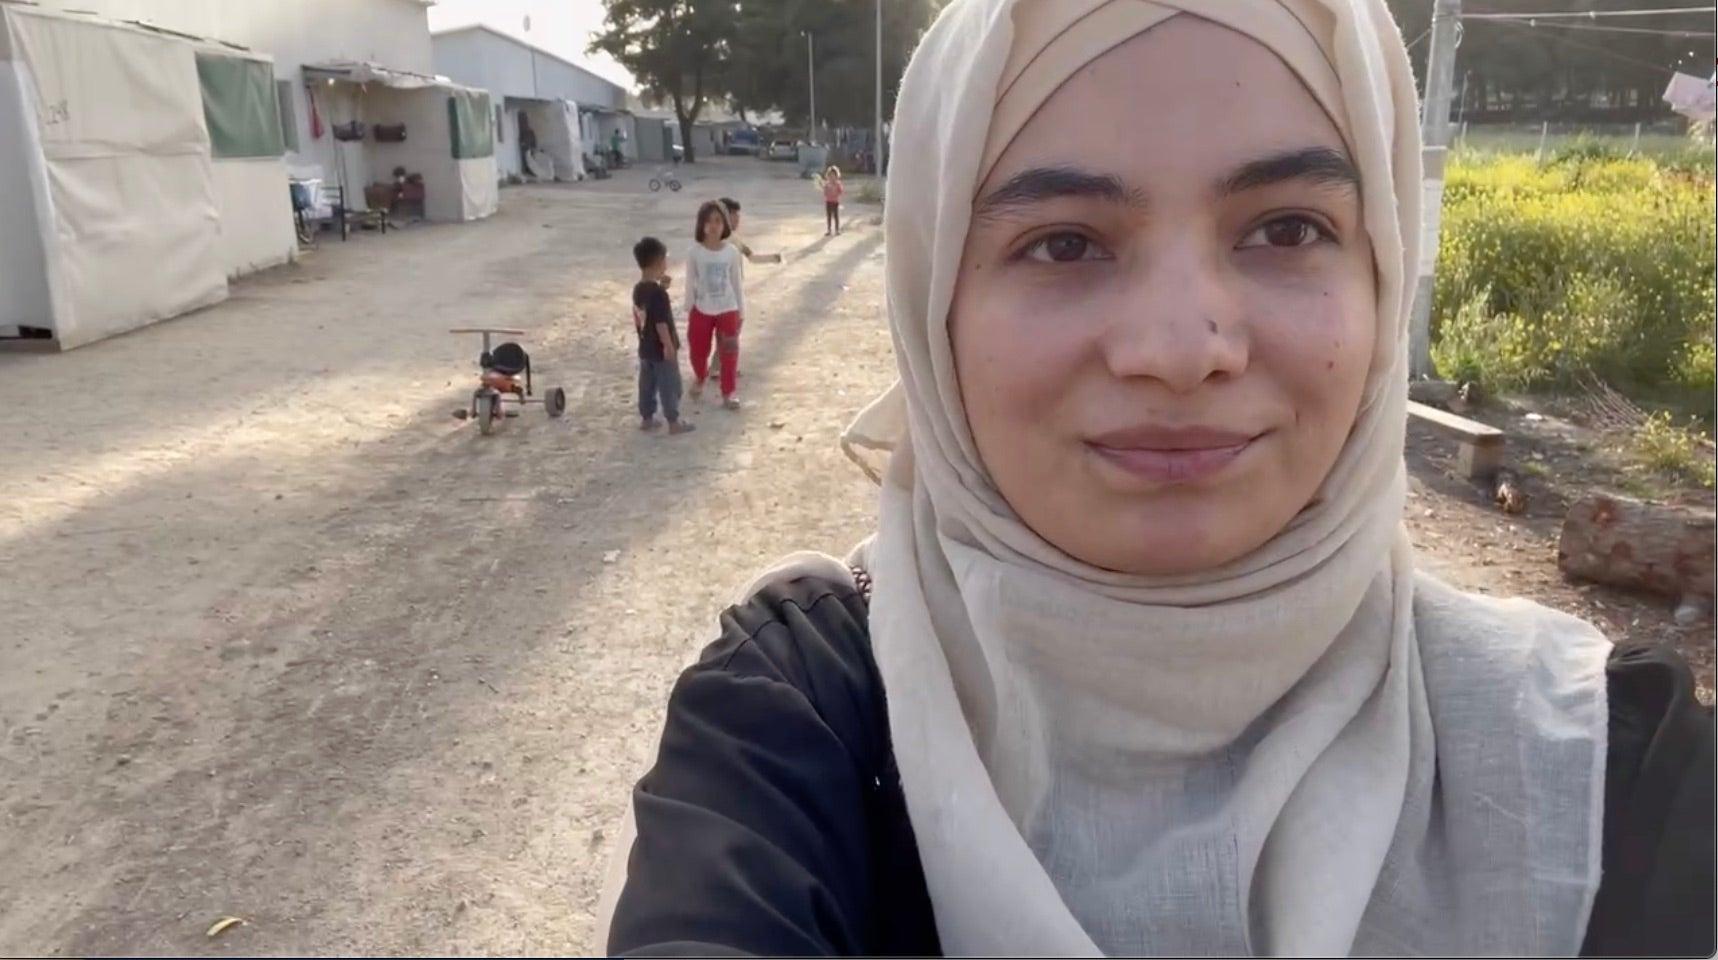 Greece: Stop Denying Refugee Children an Education